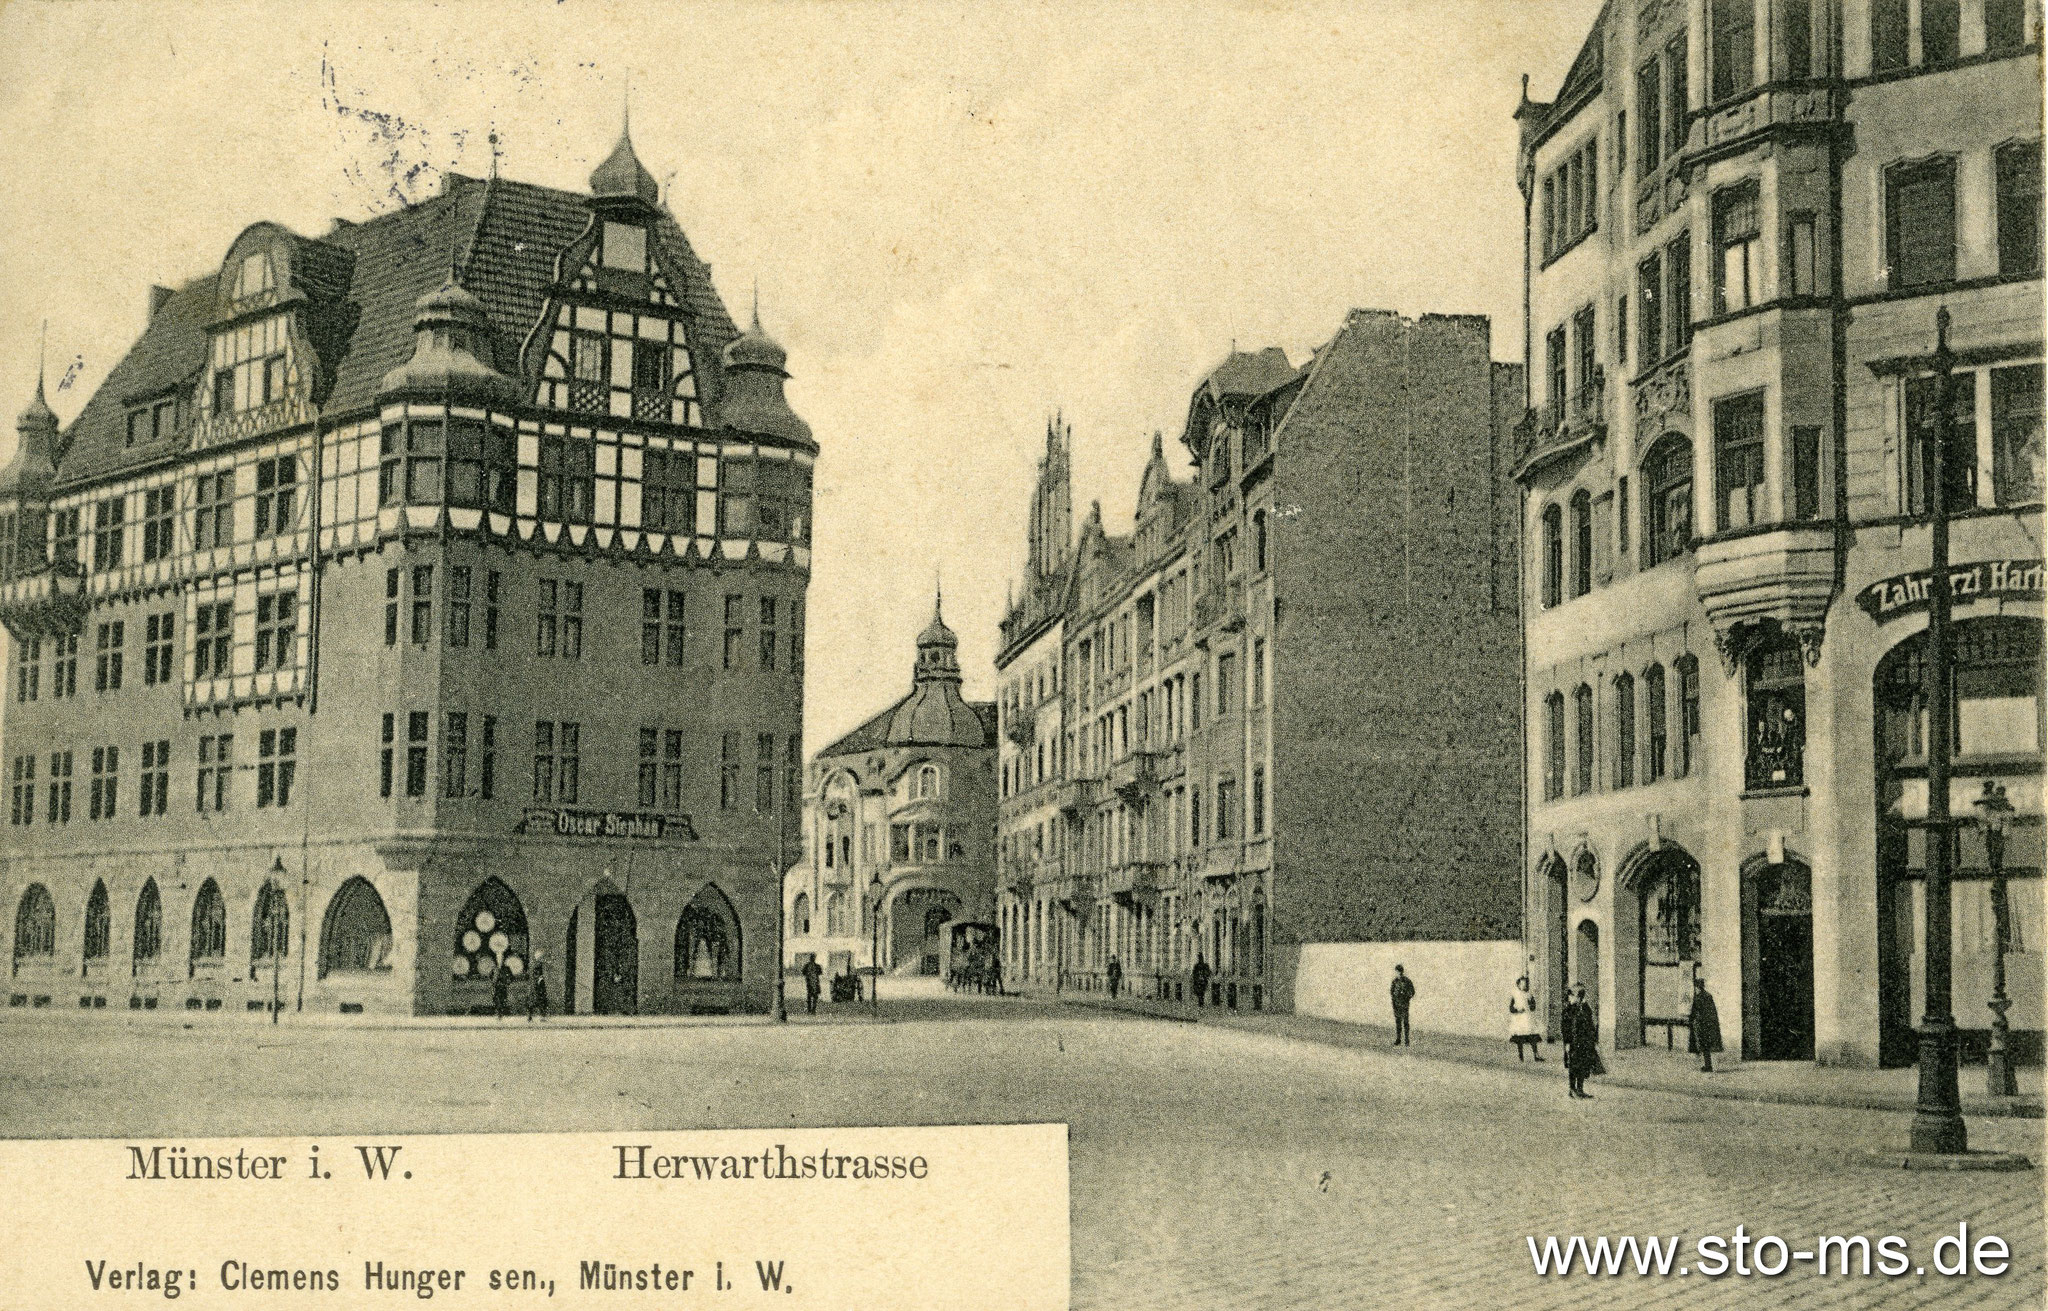 Herwerthstraße